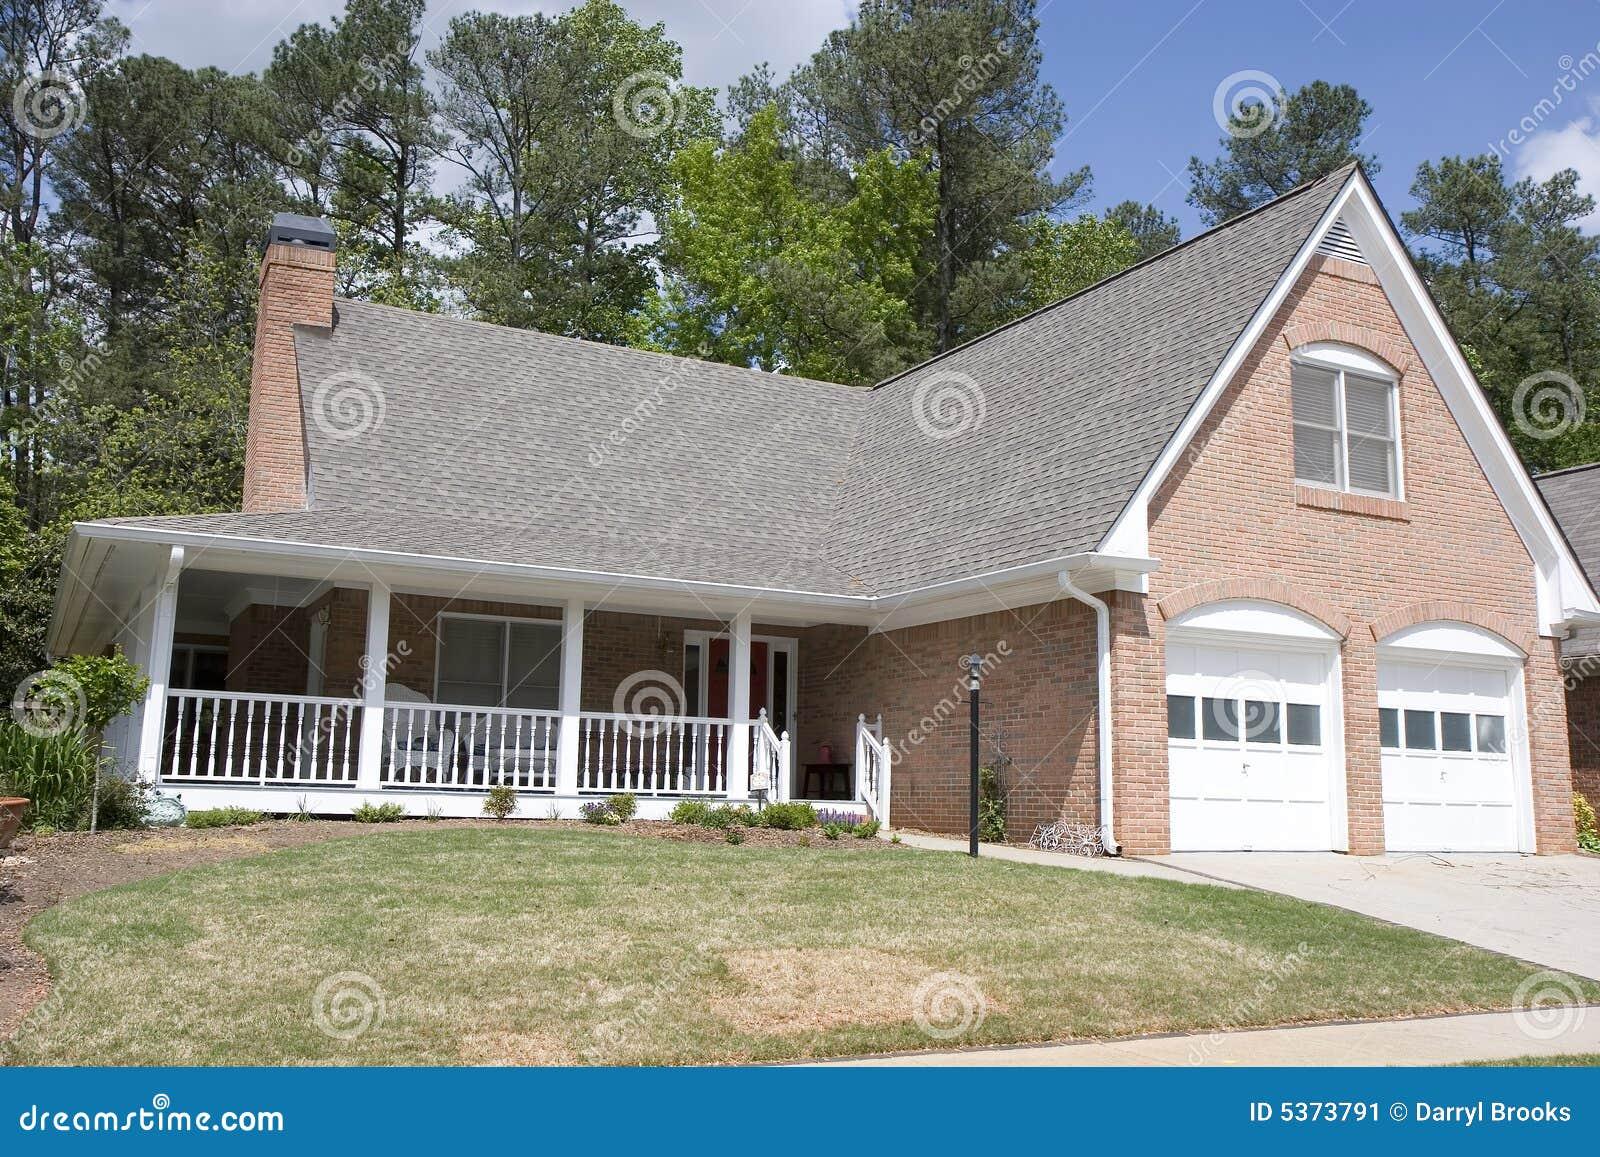 Nettes ziegelstein haus mit veranda stockbild bild 5373791 for Veranda haus